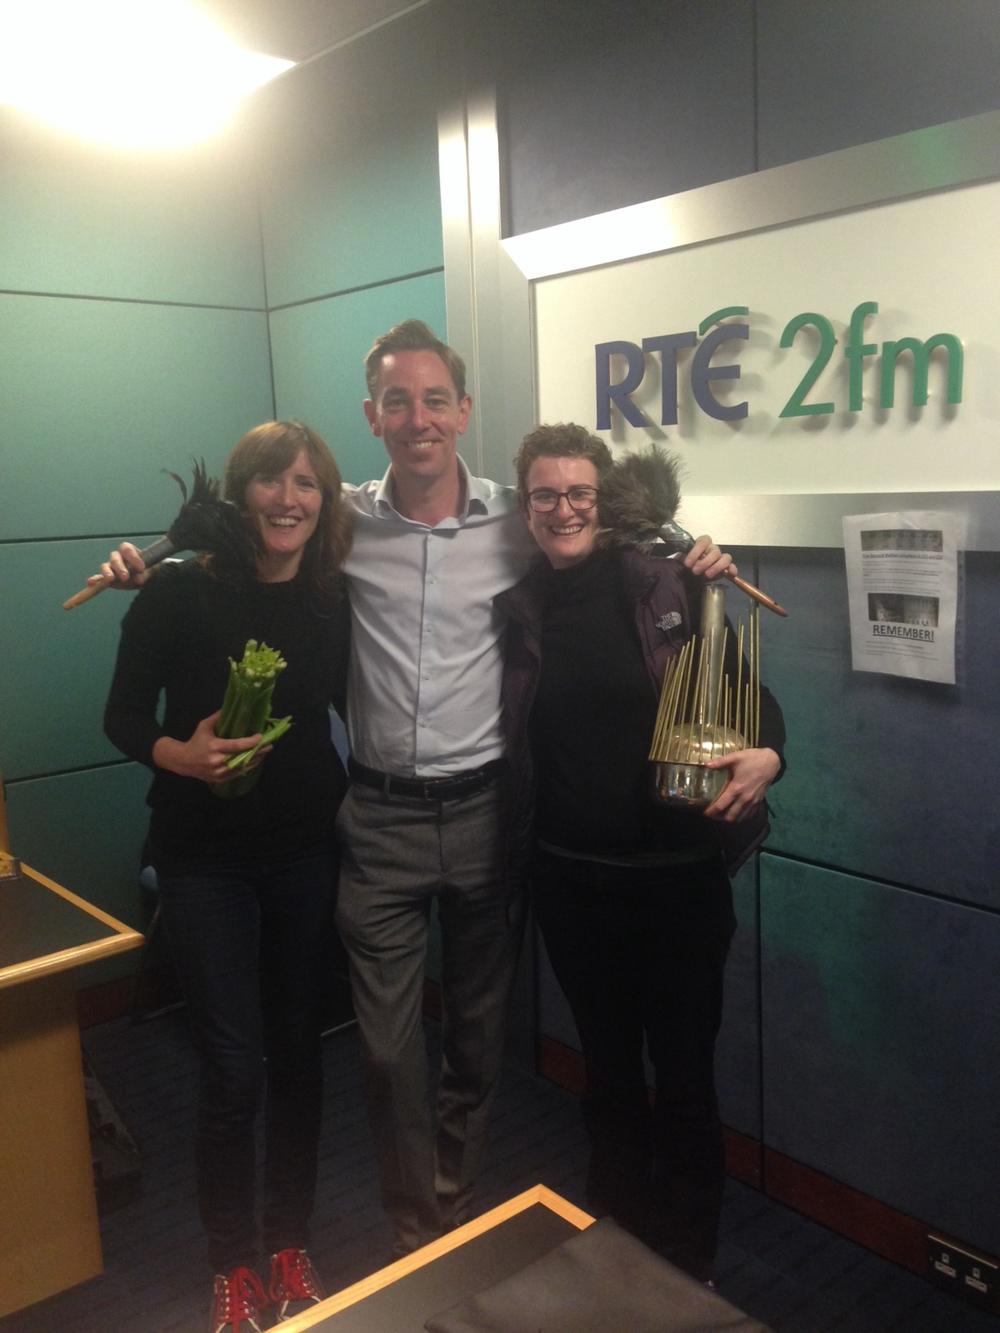 Caoimhe Doyle, Ryan Tubridy and Jean McGrathonTubridy on RTE 2FM